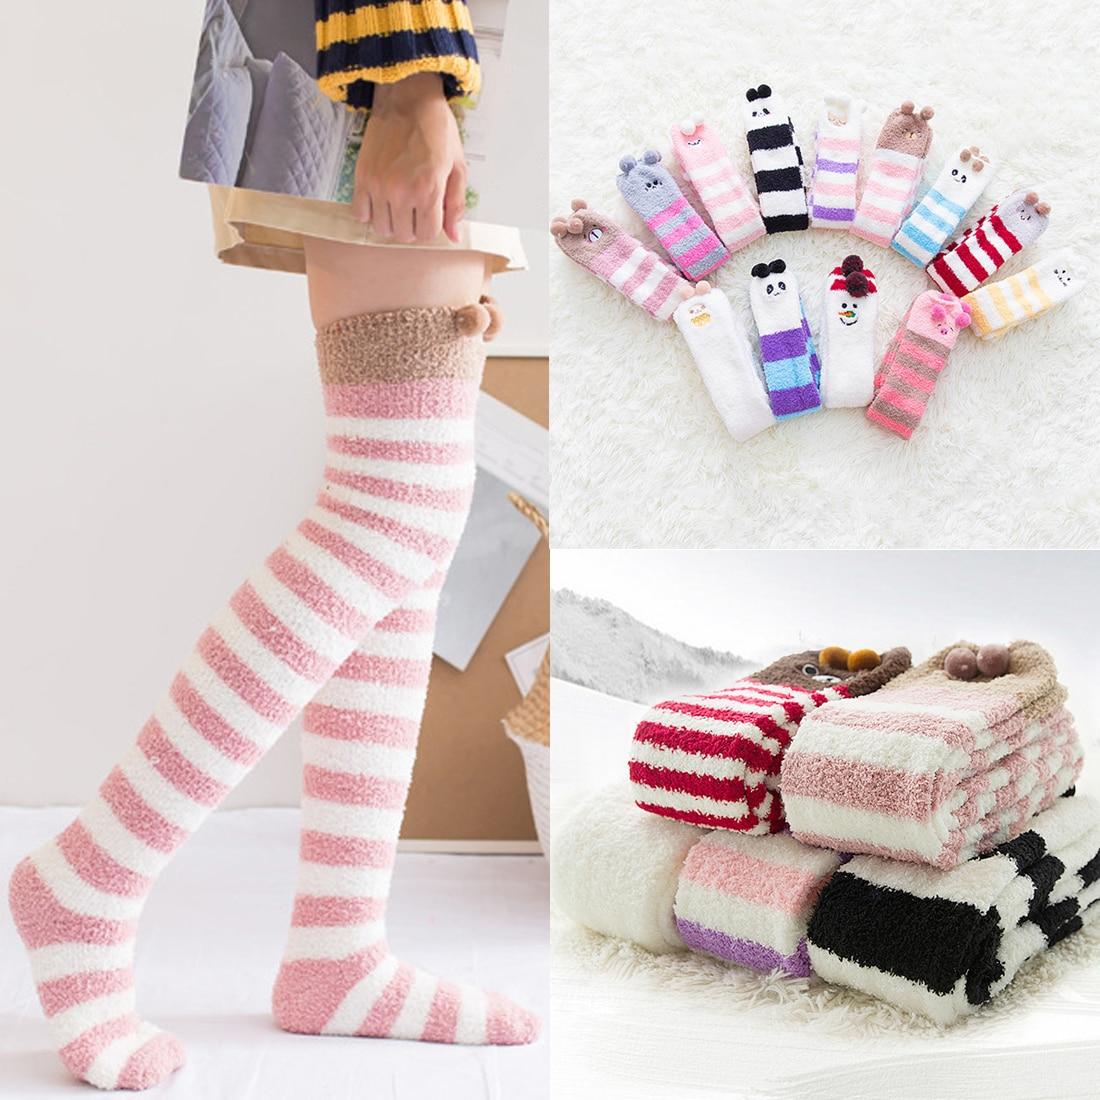 Medias Japanese Girl Animal Modeling Socks Winter Warm Knee Sock Sleep Top Sell Striped Cute Lovely Kawaii Long Thigh High Socks